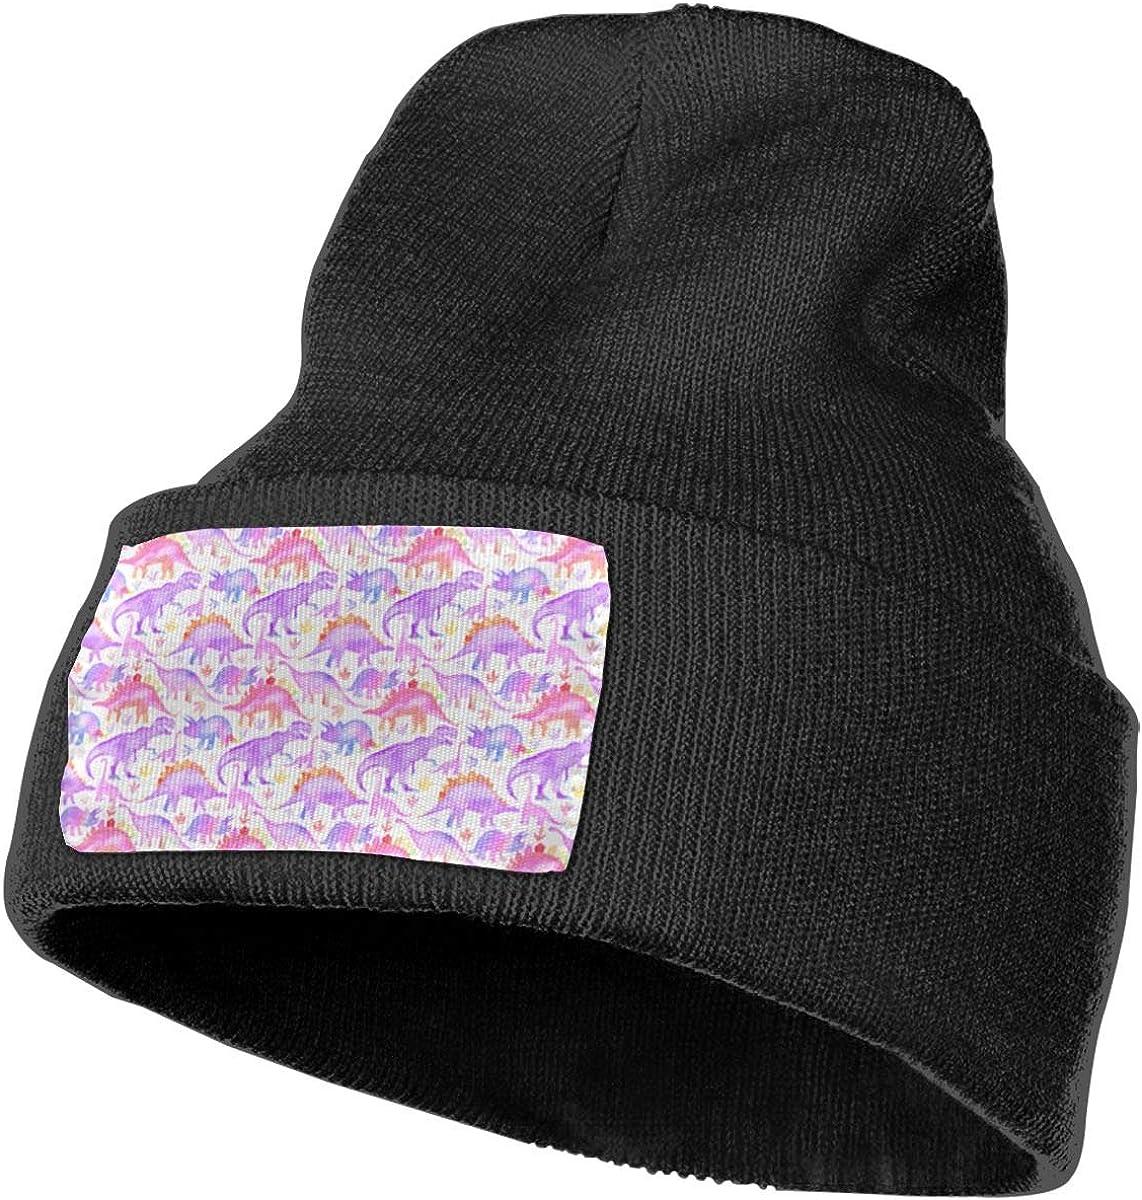 Ruin Dinosaur Fashion Knitting Hat for Men Women 100/% Acrylic Acid Mas Beanie Hat